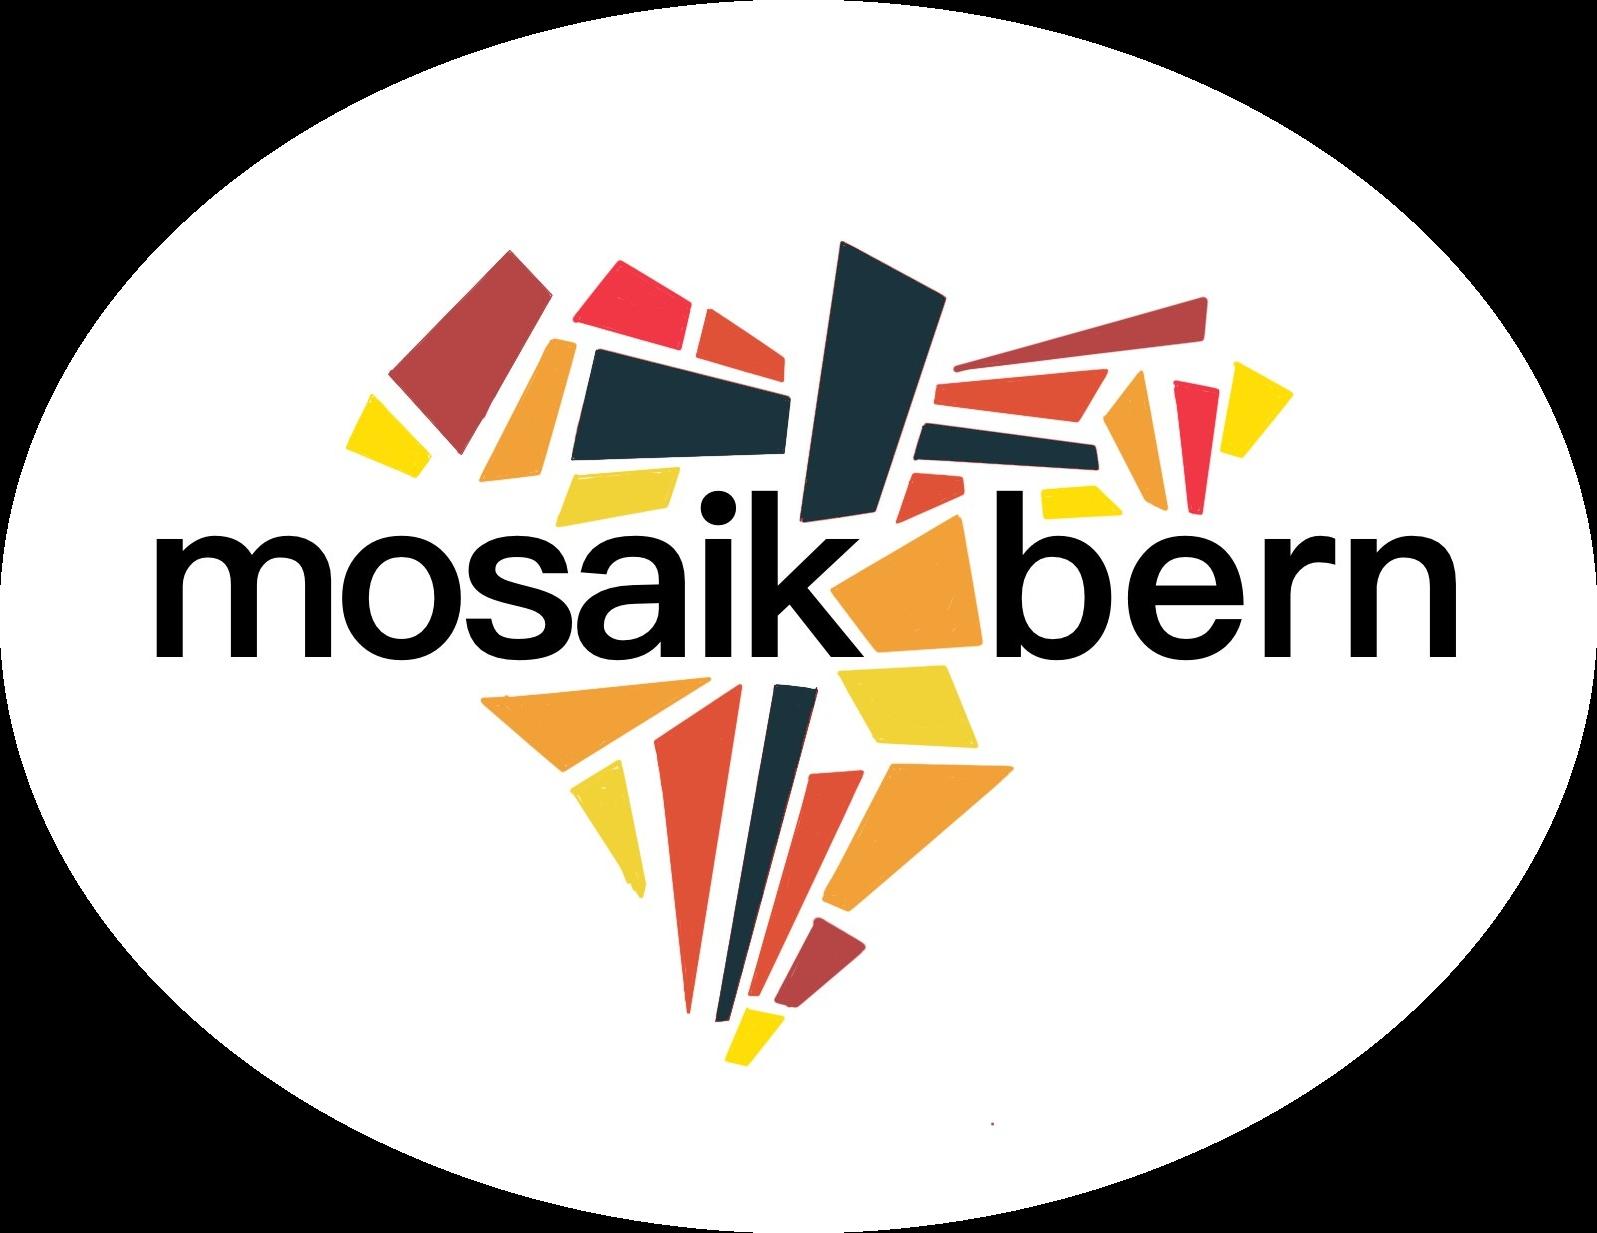 Mosaik Bern